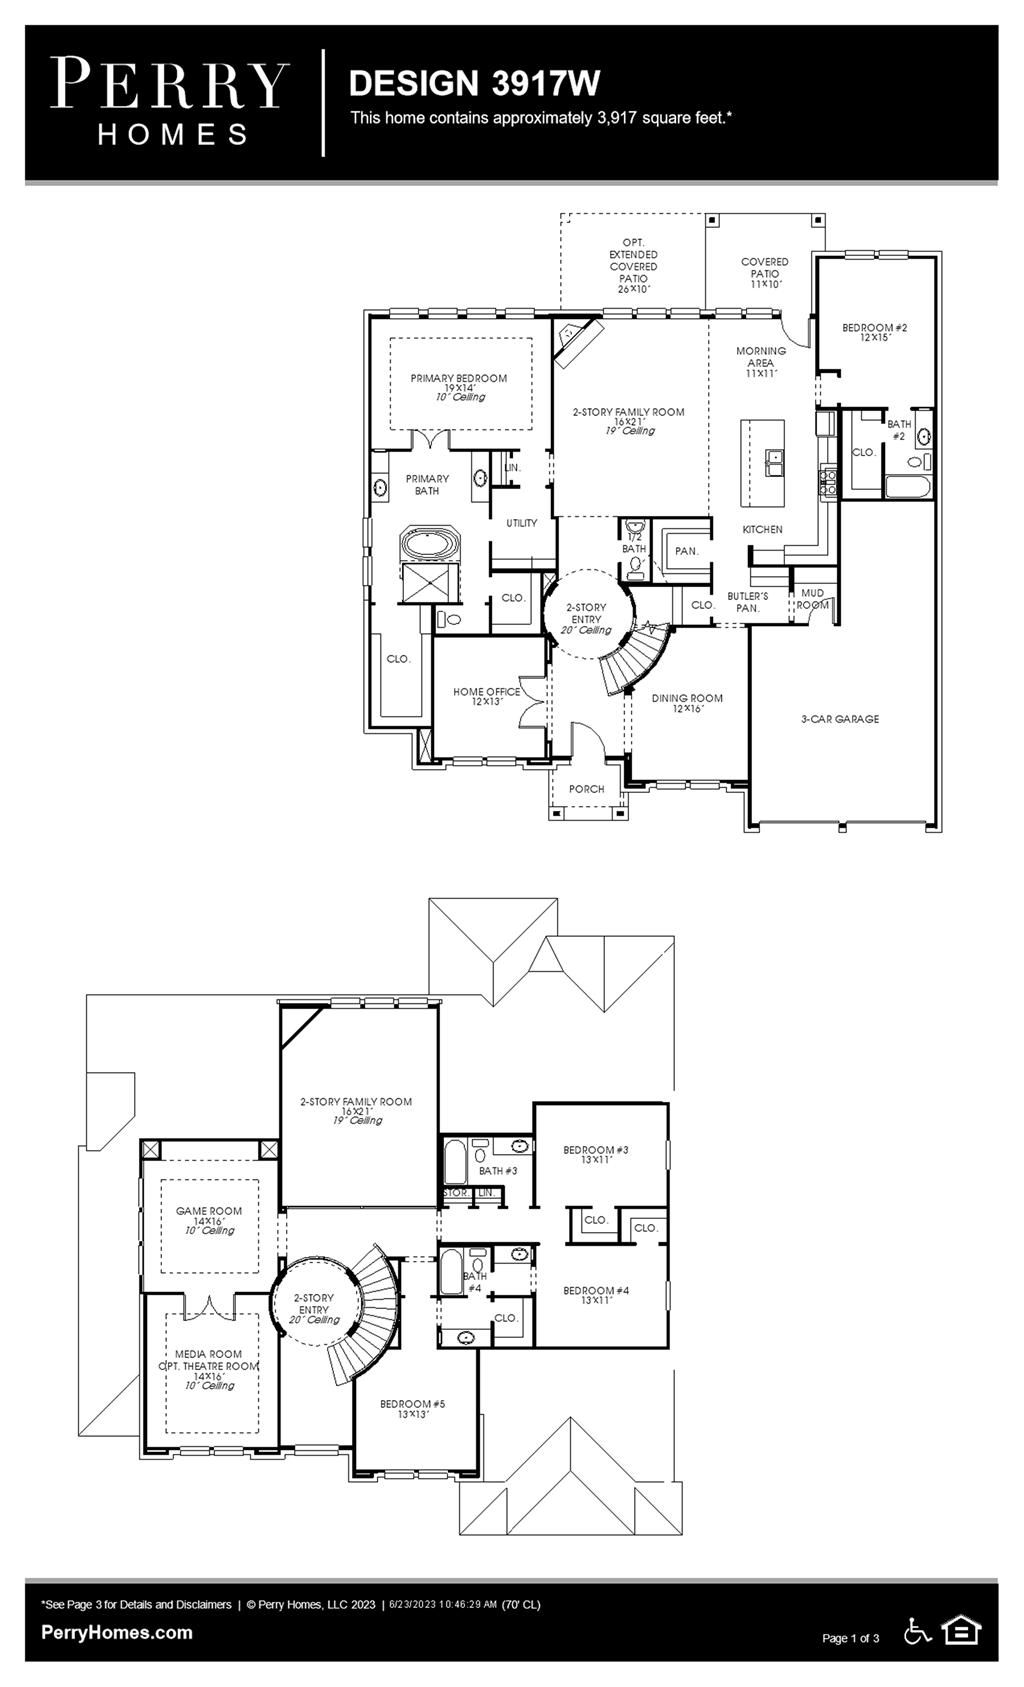 Floor Plan for 3917W